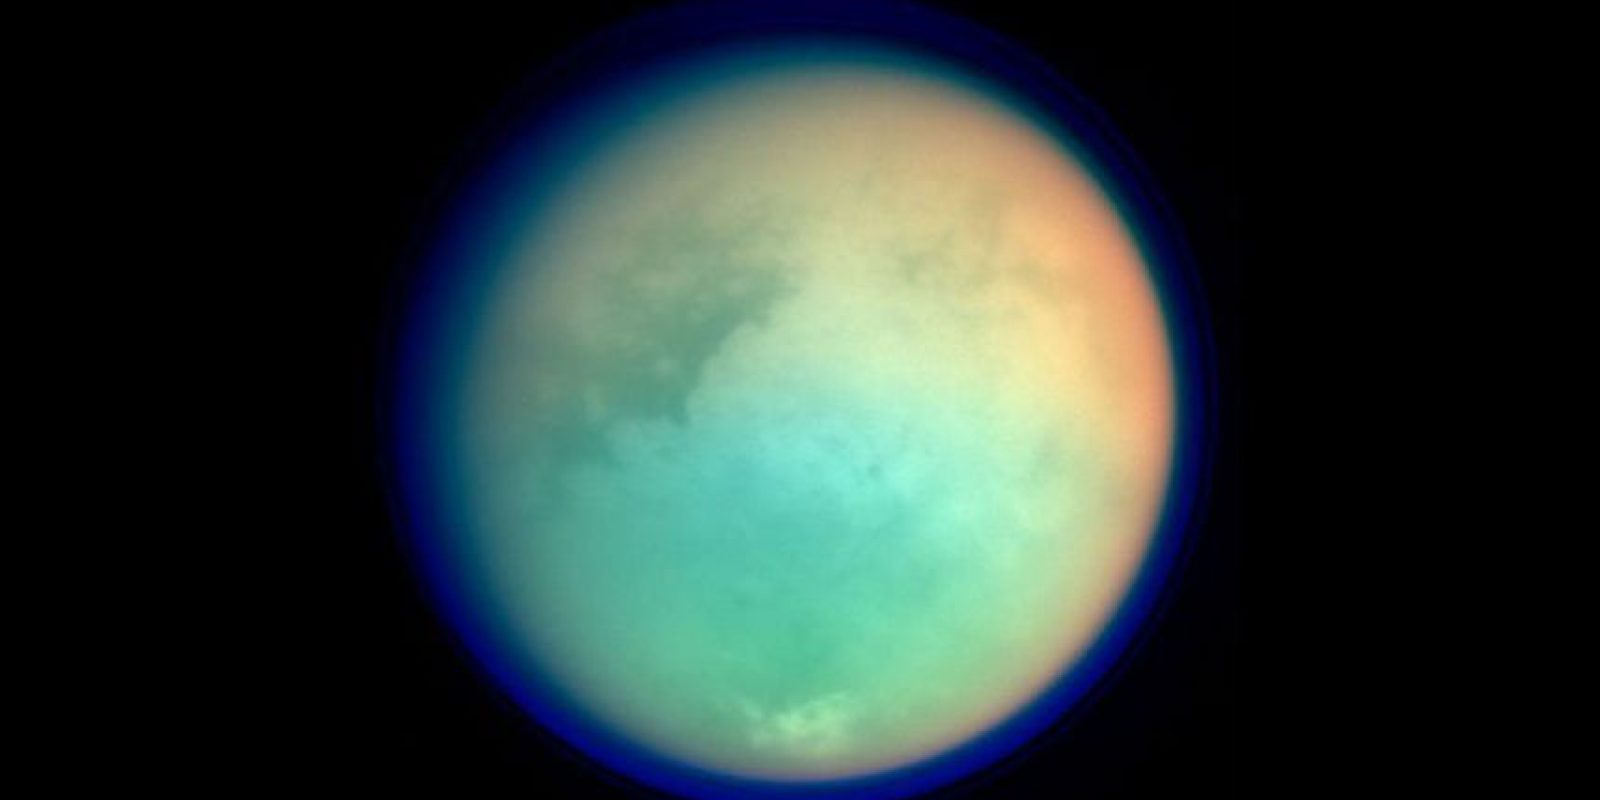 Titán Foto:NASA